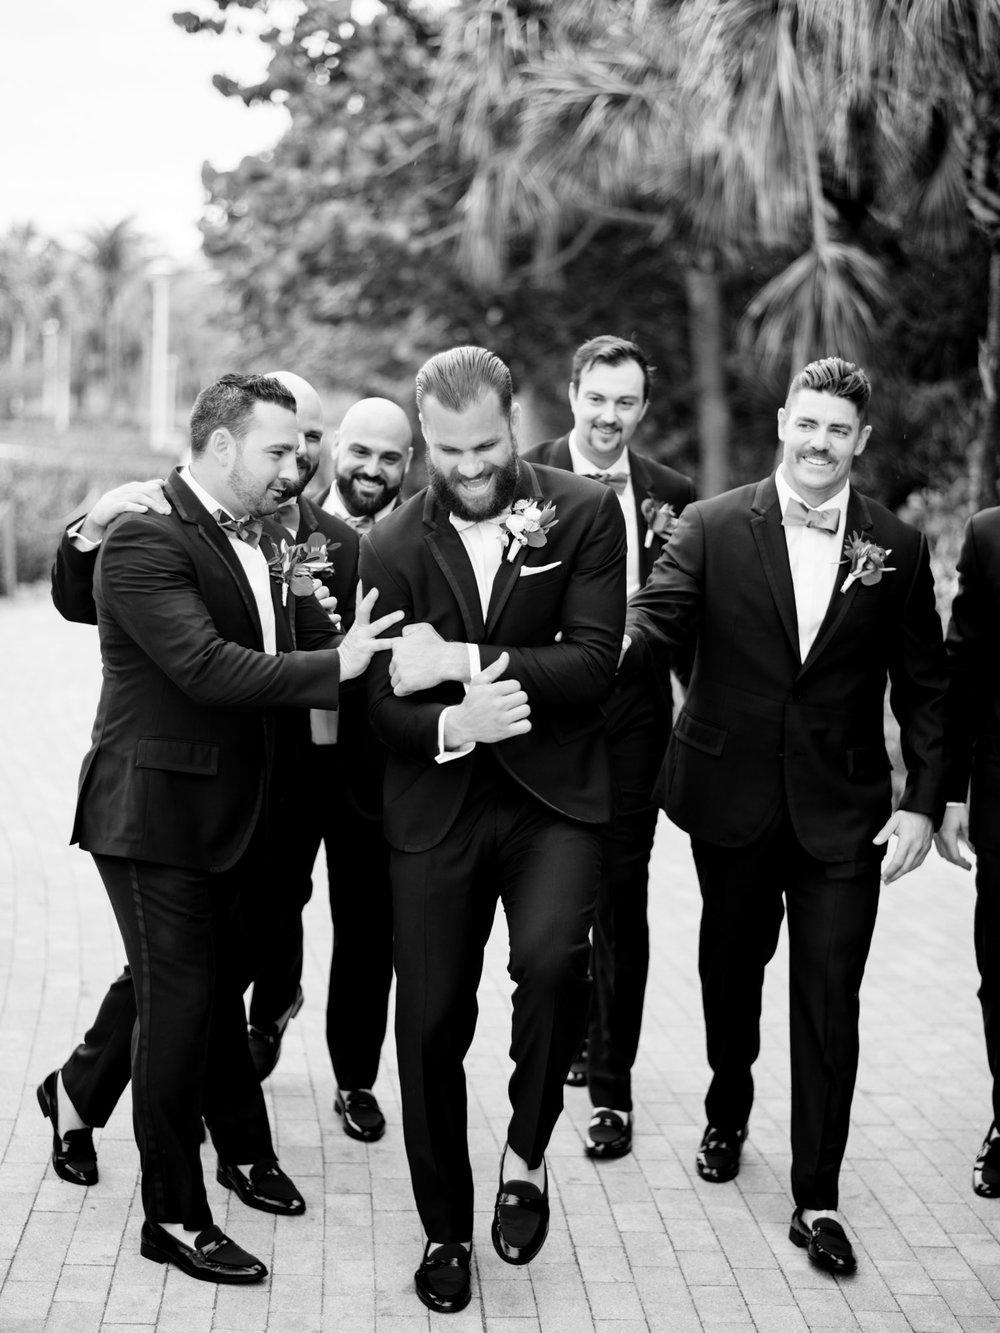 raleigh-miami-beach-destination-film-wedding-0891.jpg